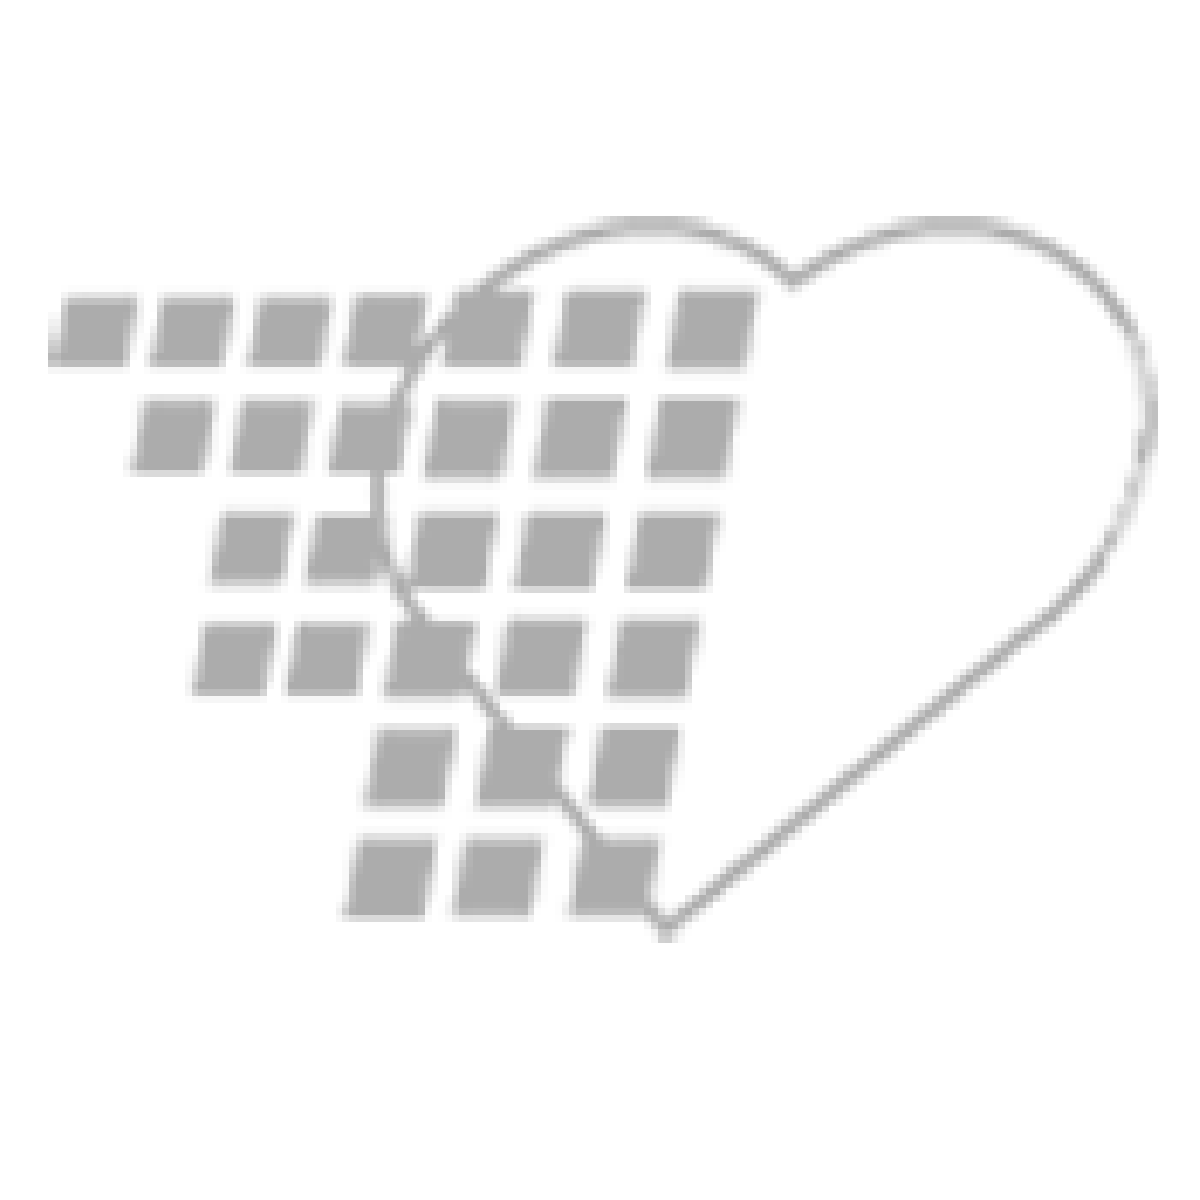 06-93-6921 - Demo Dose® Isopreterenl hydrochlorid (Isoprl) 0.2mg/mL 1mL